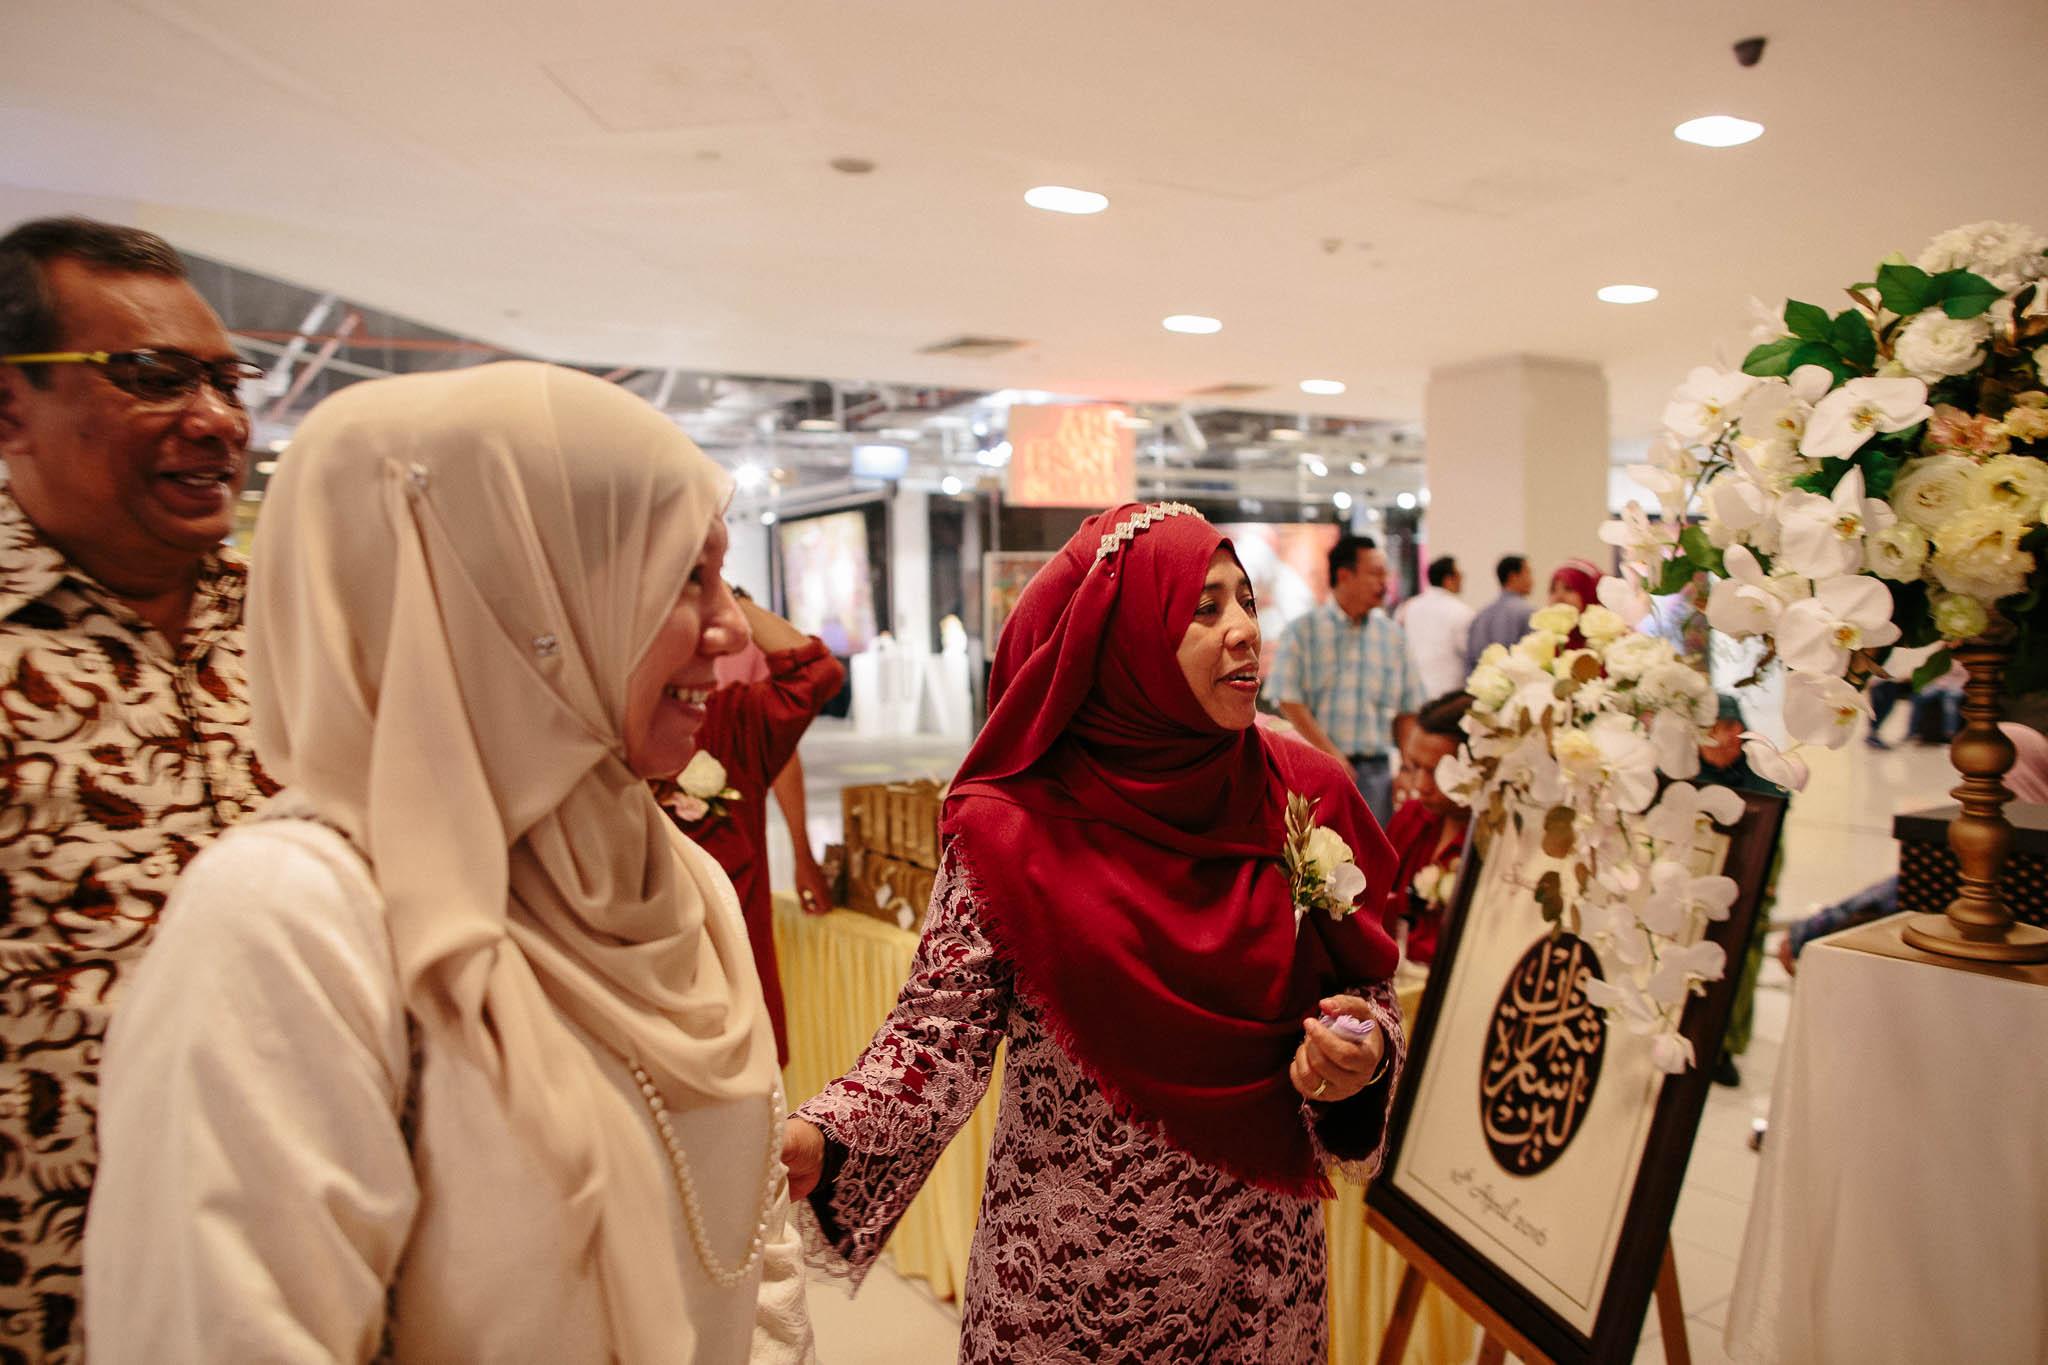 singapore-wedding-photographer-sharalyn-syazwan-062.jpg